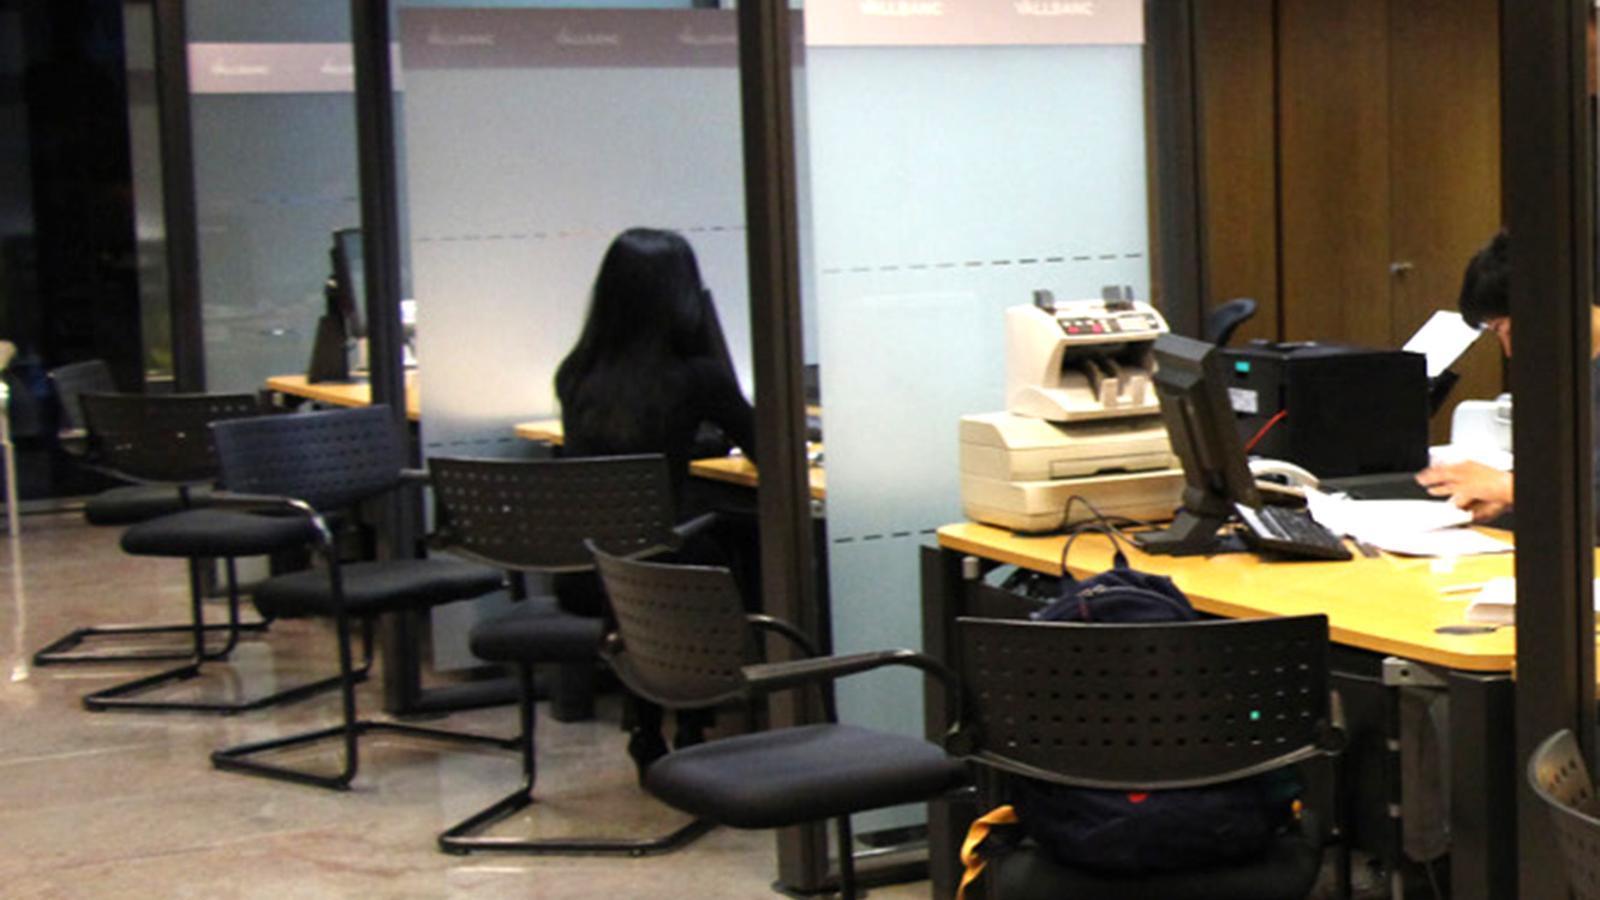 Una oficina bancària. / ARXIU ANA